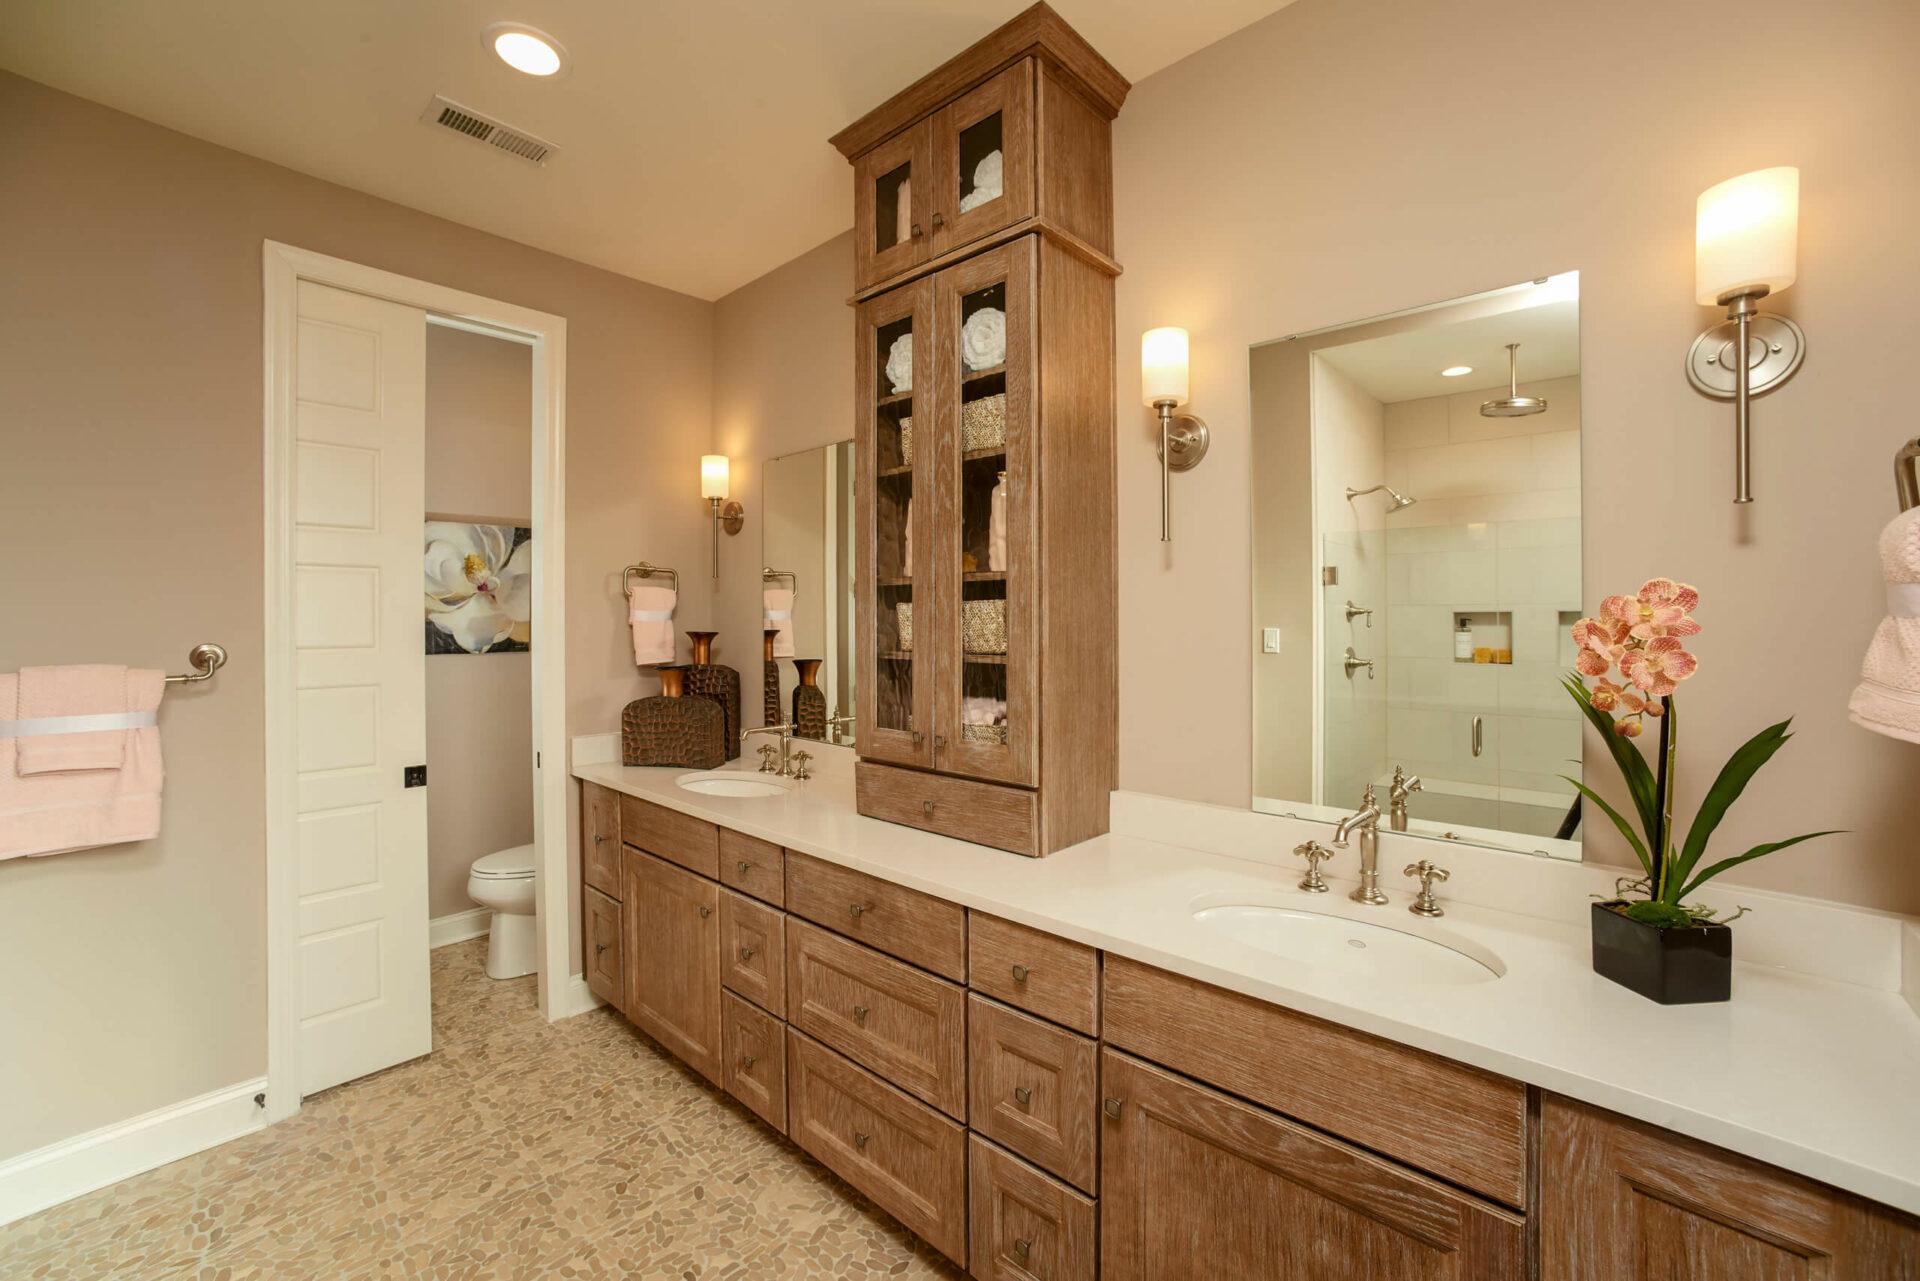 Franklin rustic master bathroom